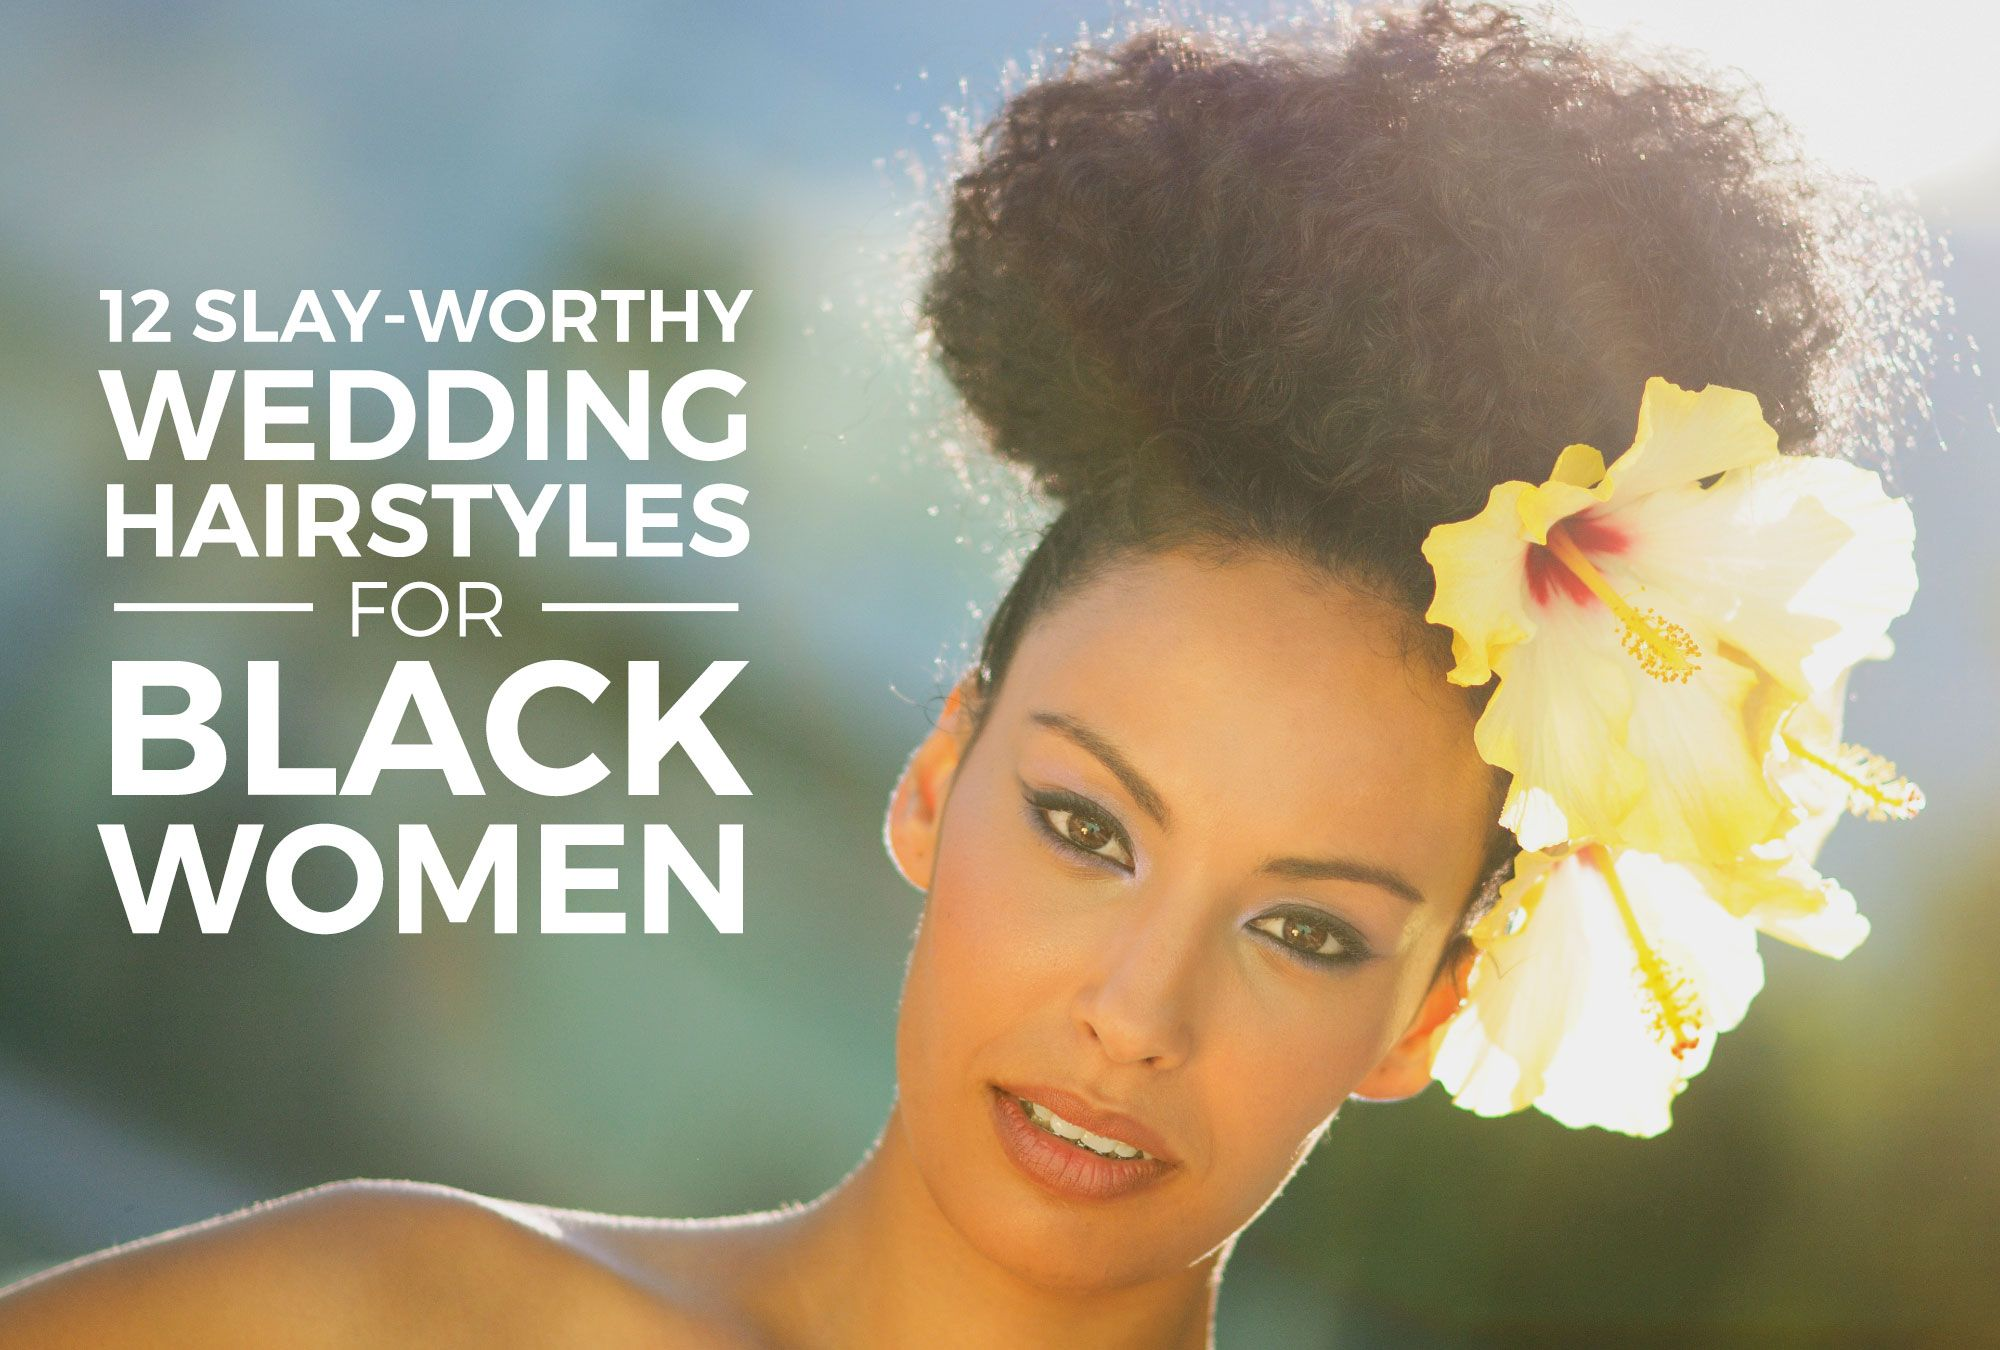 12 Slay-Worthy Wedding Hairstyles For Black Women